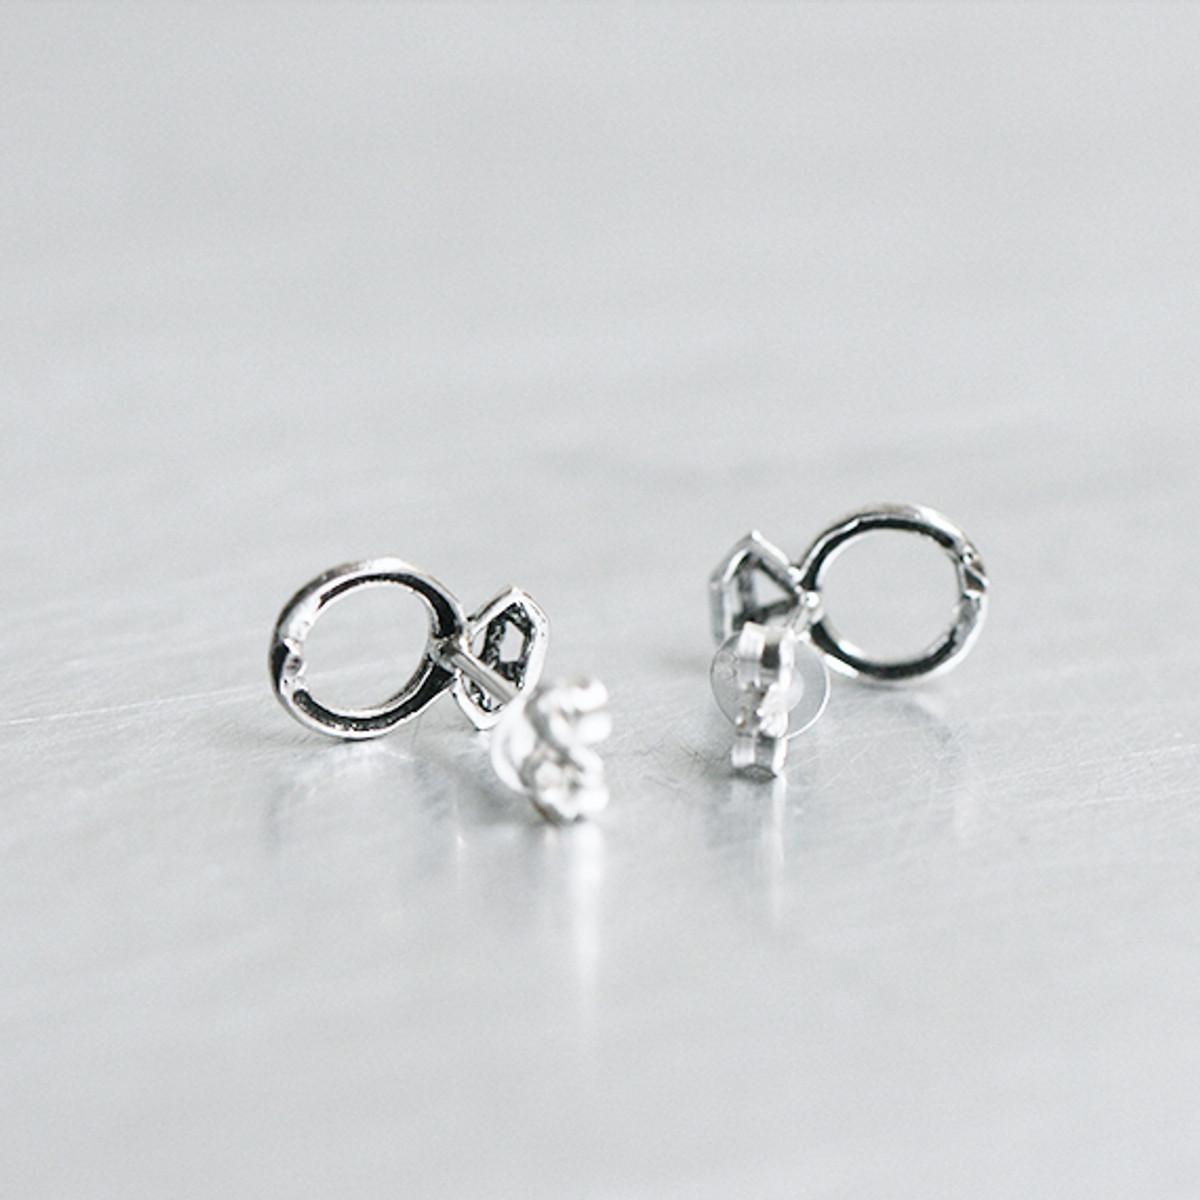 0eeda9fbe Oxidized Silver Tiny Diamond Ring Stud Earrings from kellinsilver.com